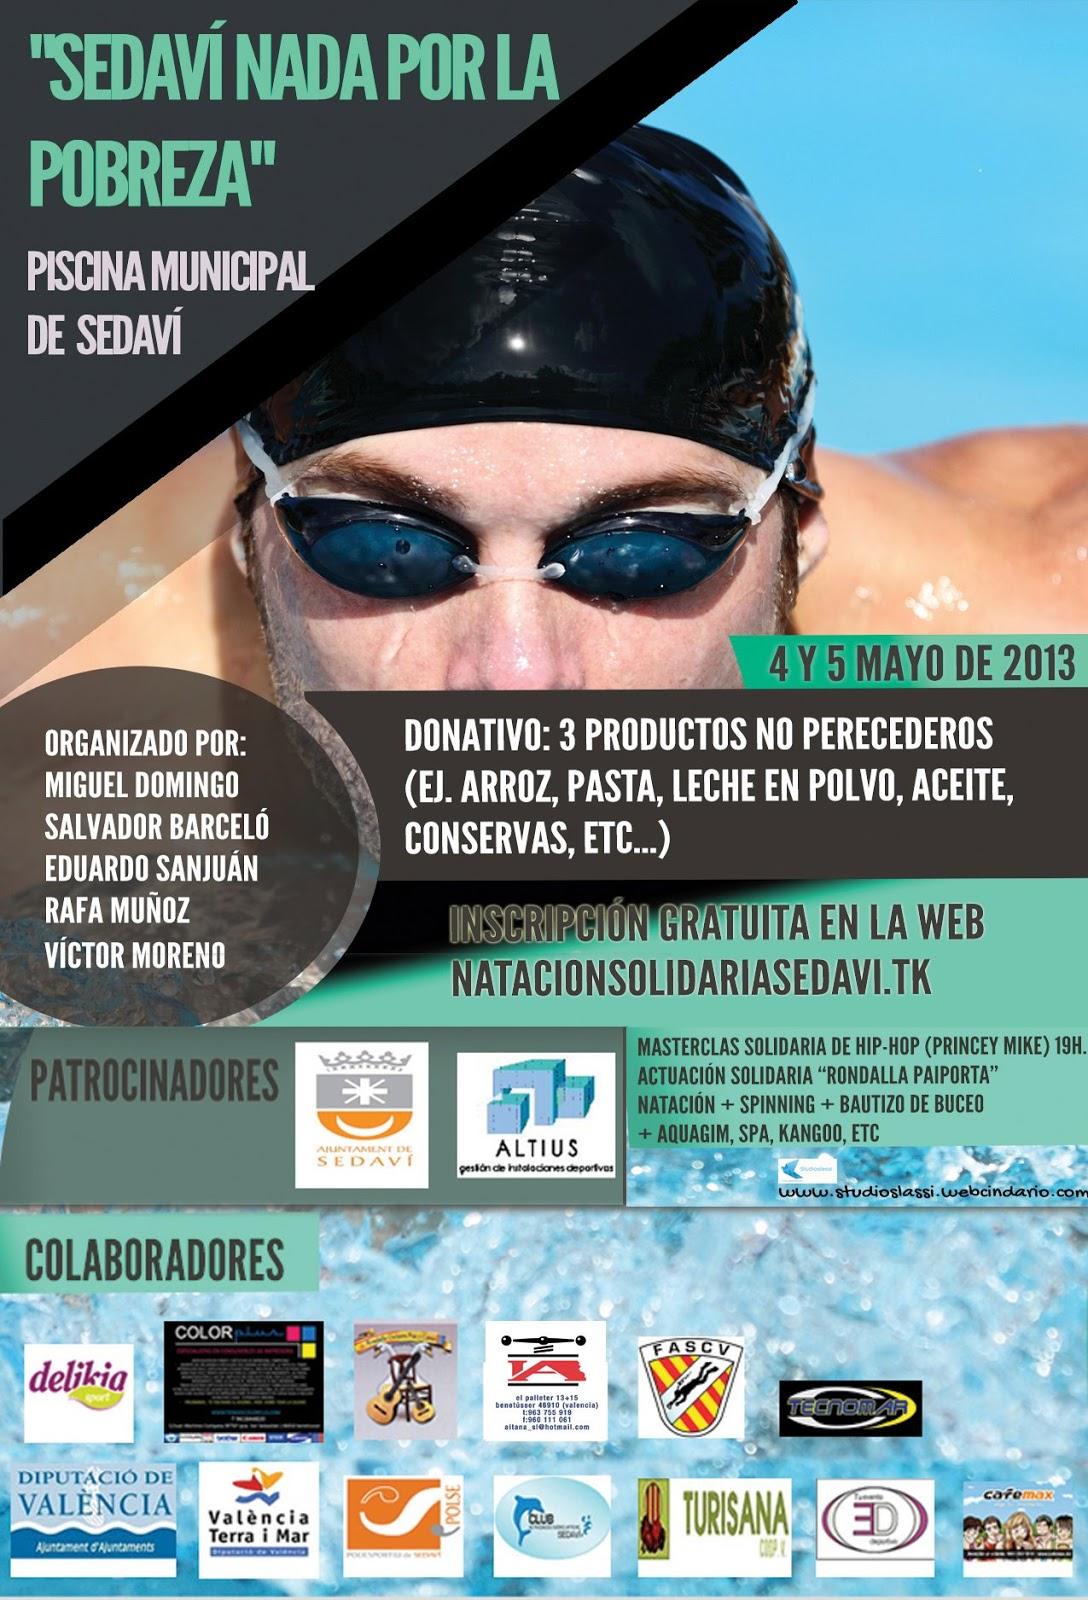 El rincon del nadador evento sedavi nada por la pobreza for Piscina sedavi